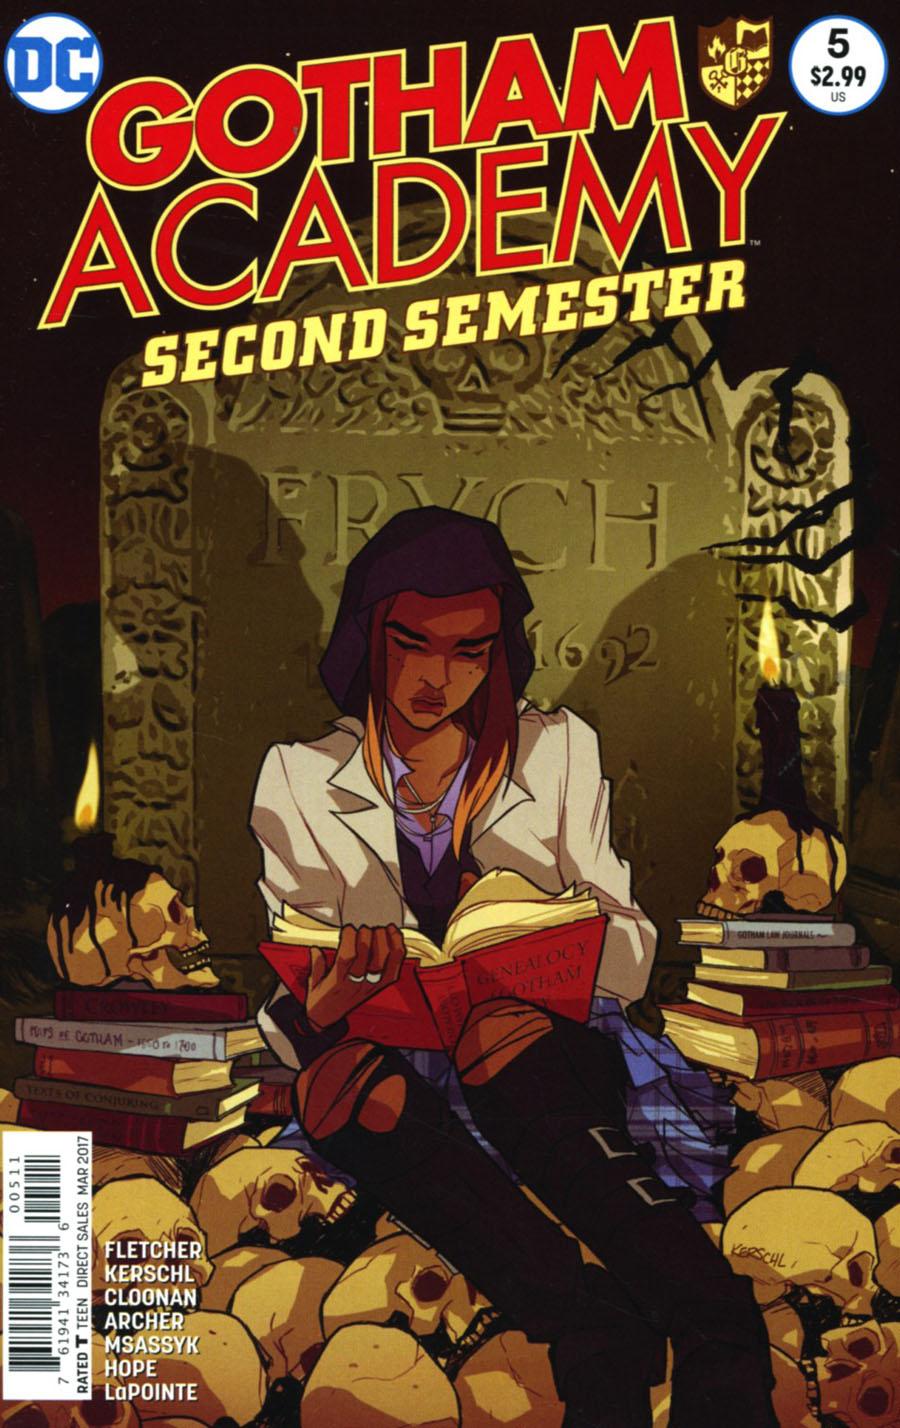 Gotham Academy Second Semester #5